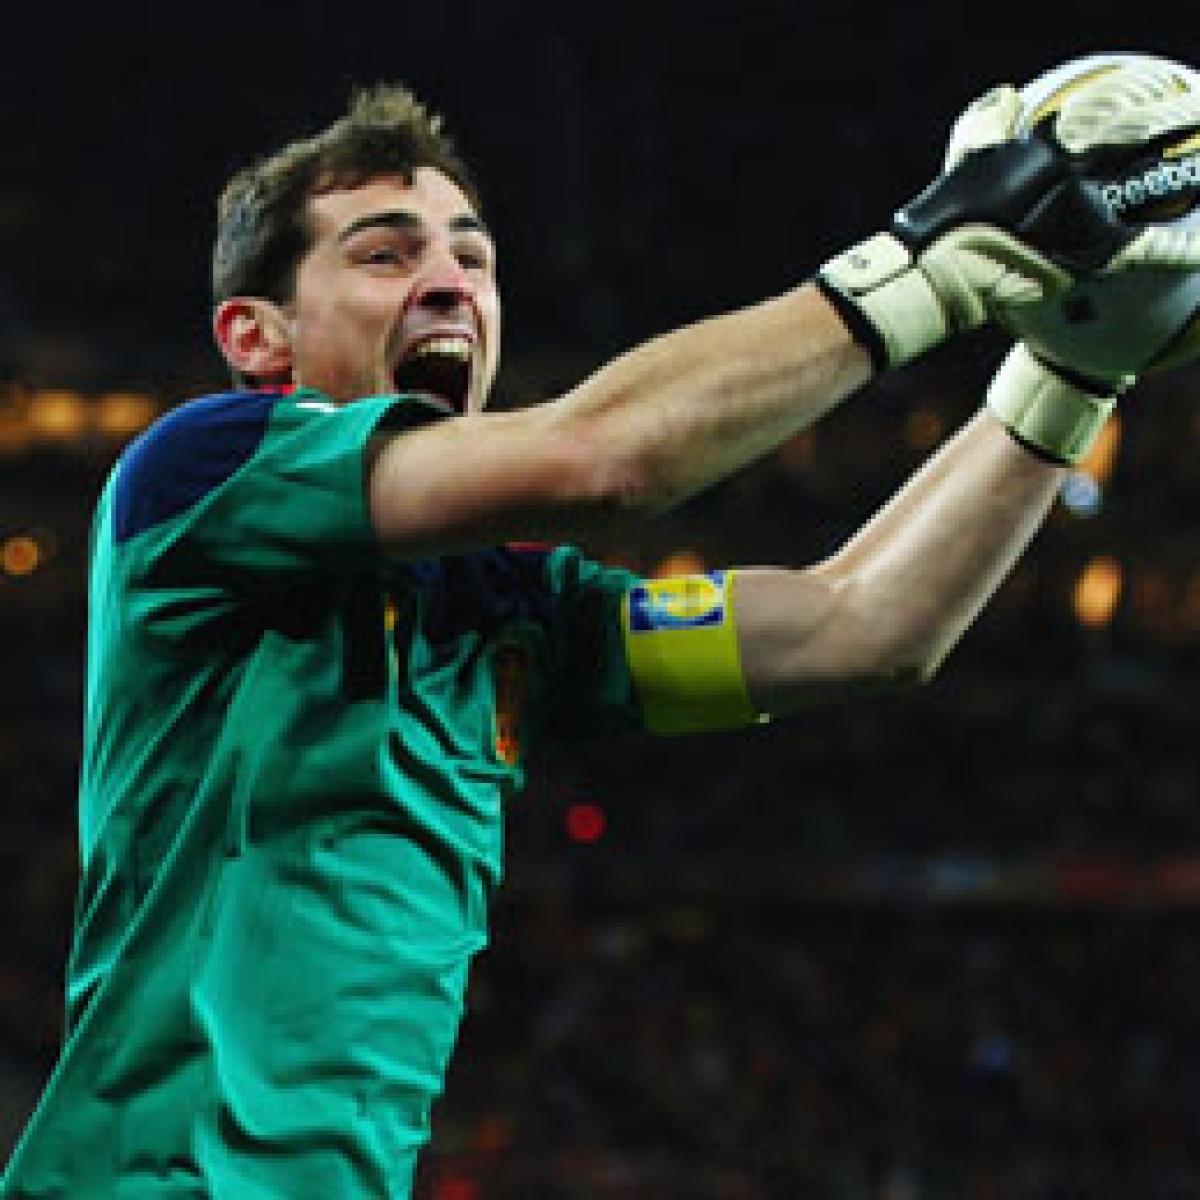 '11+2=13': Iker Casillas' reminds Gerard Pique of Madrid's Champions League title